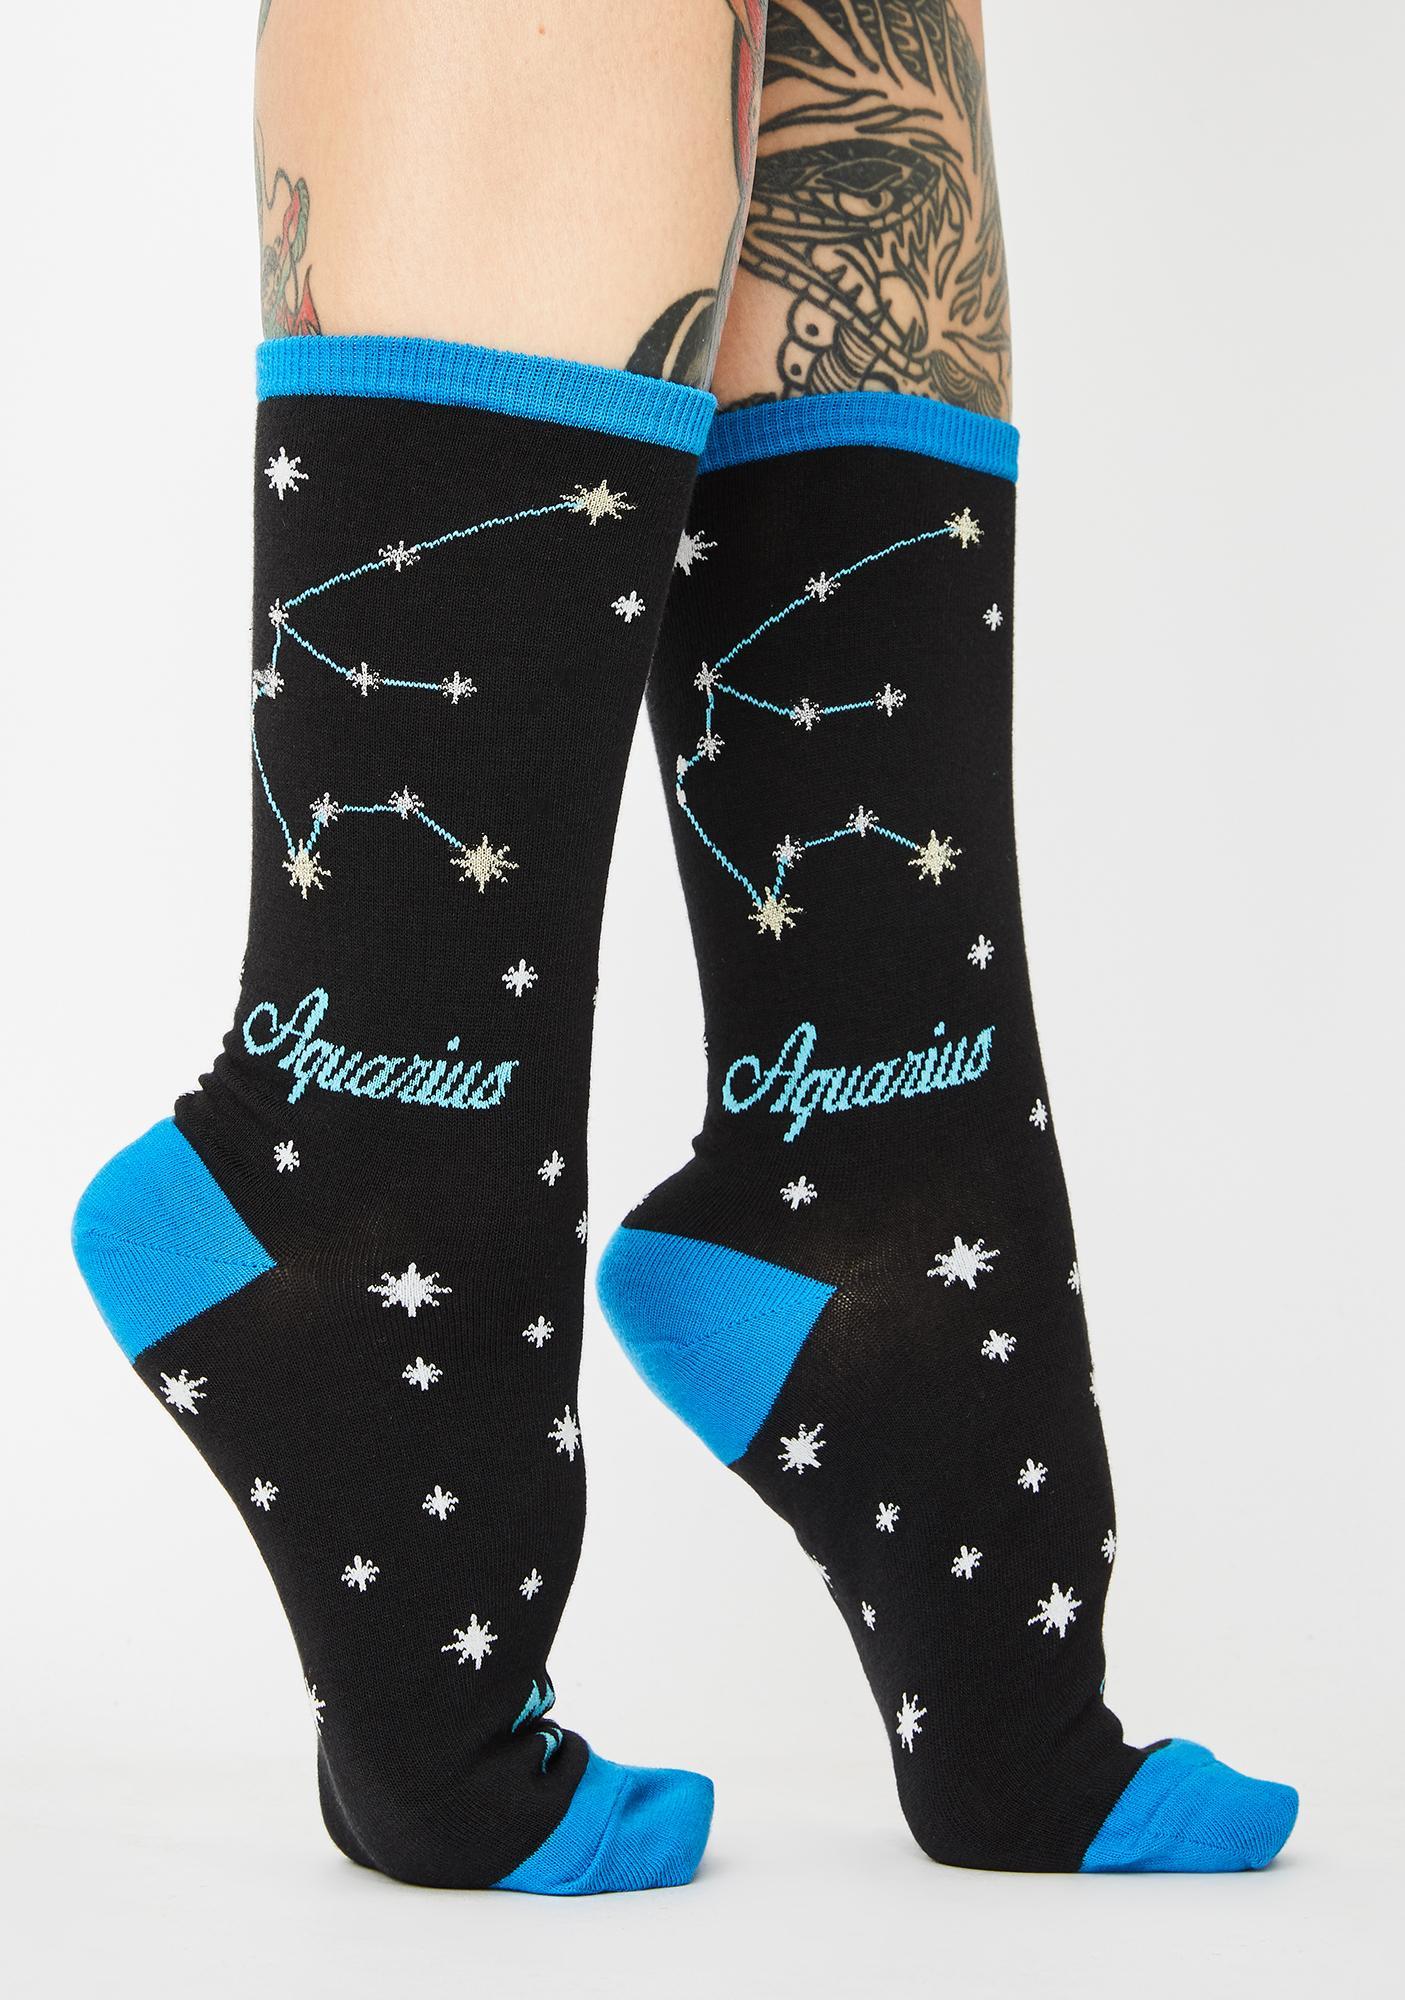 Socksmith Design Aquarius Crew Socks